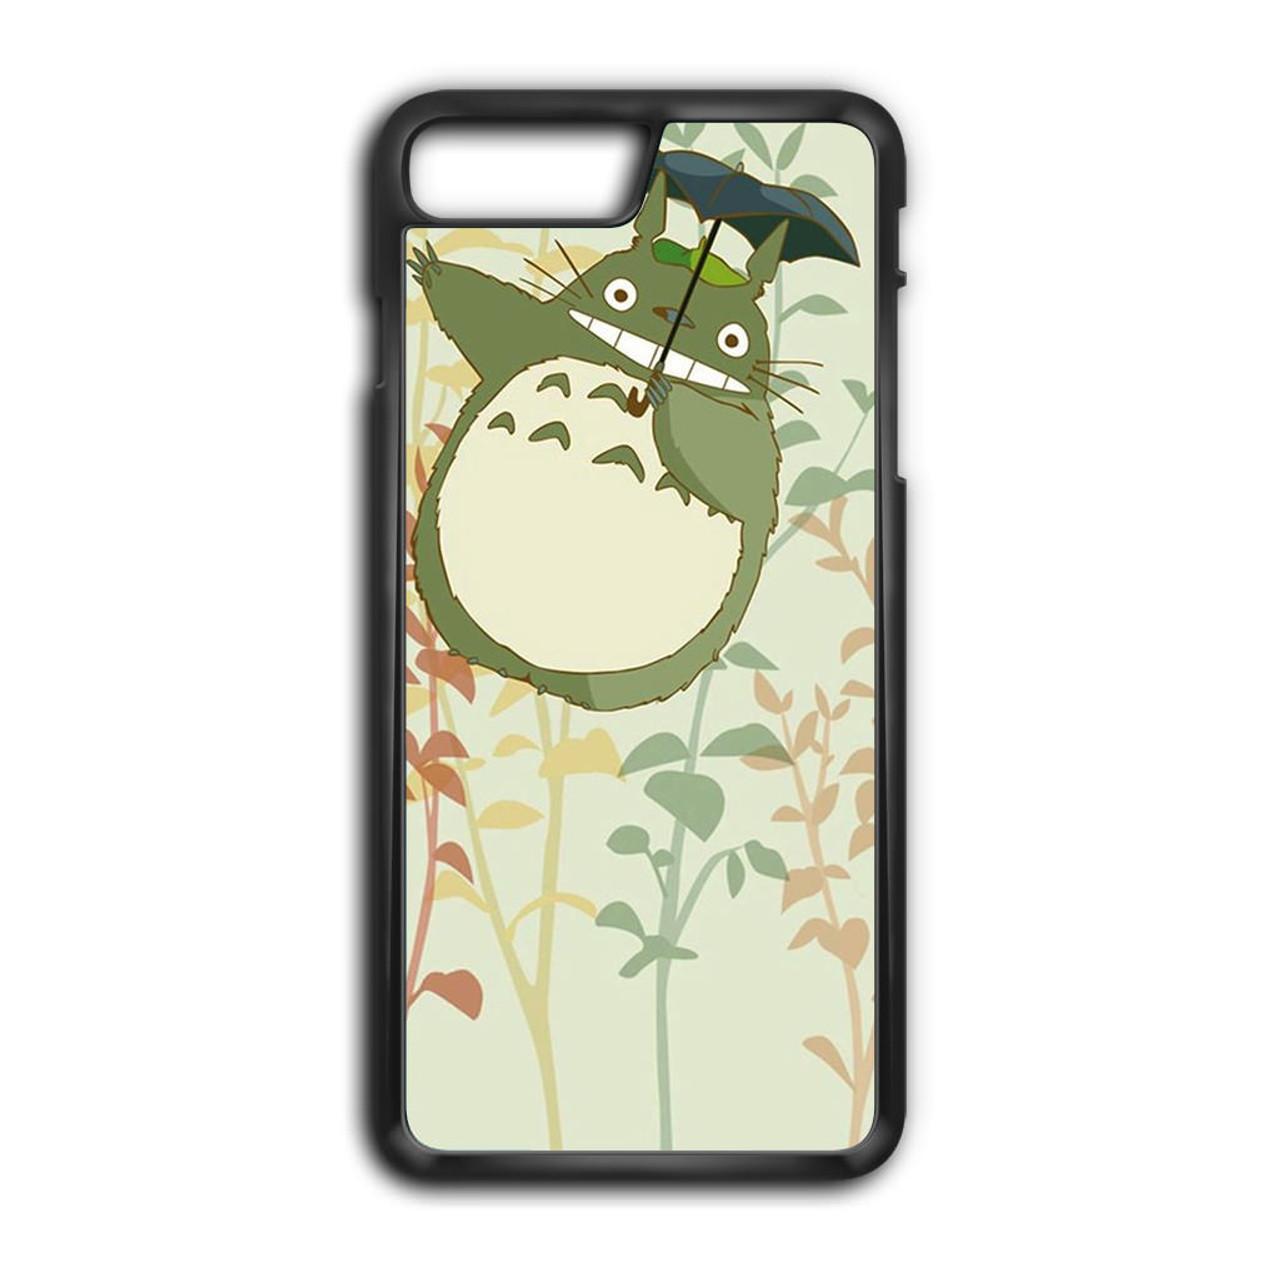 new concept a3356 ad5e1 My Neighbor Totoro Cute iPhone 7 Plus Case